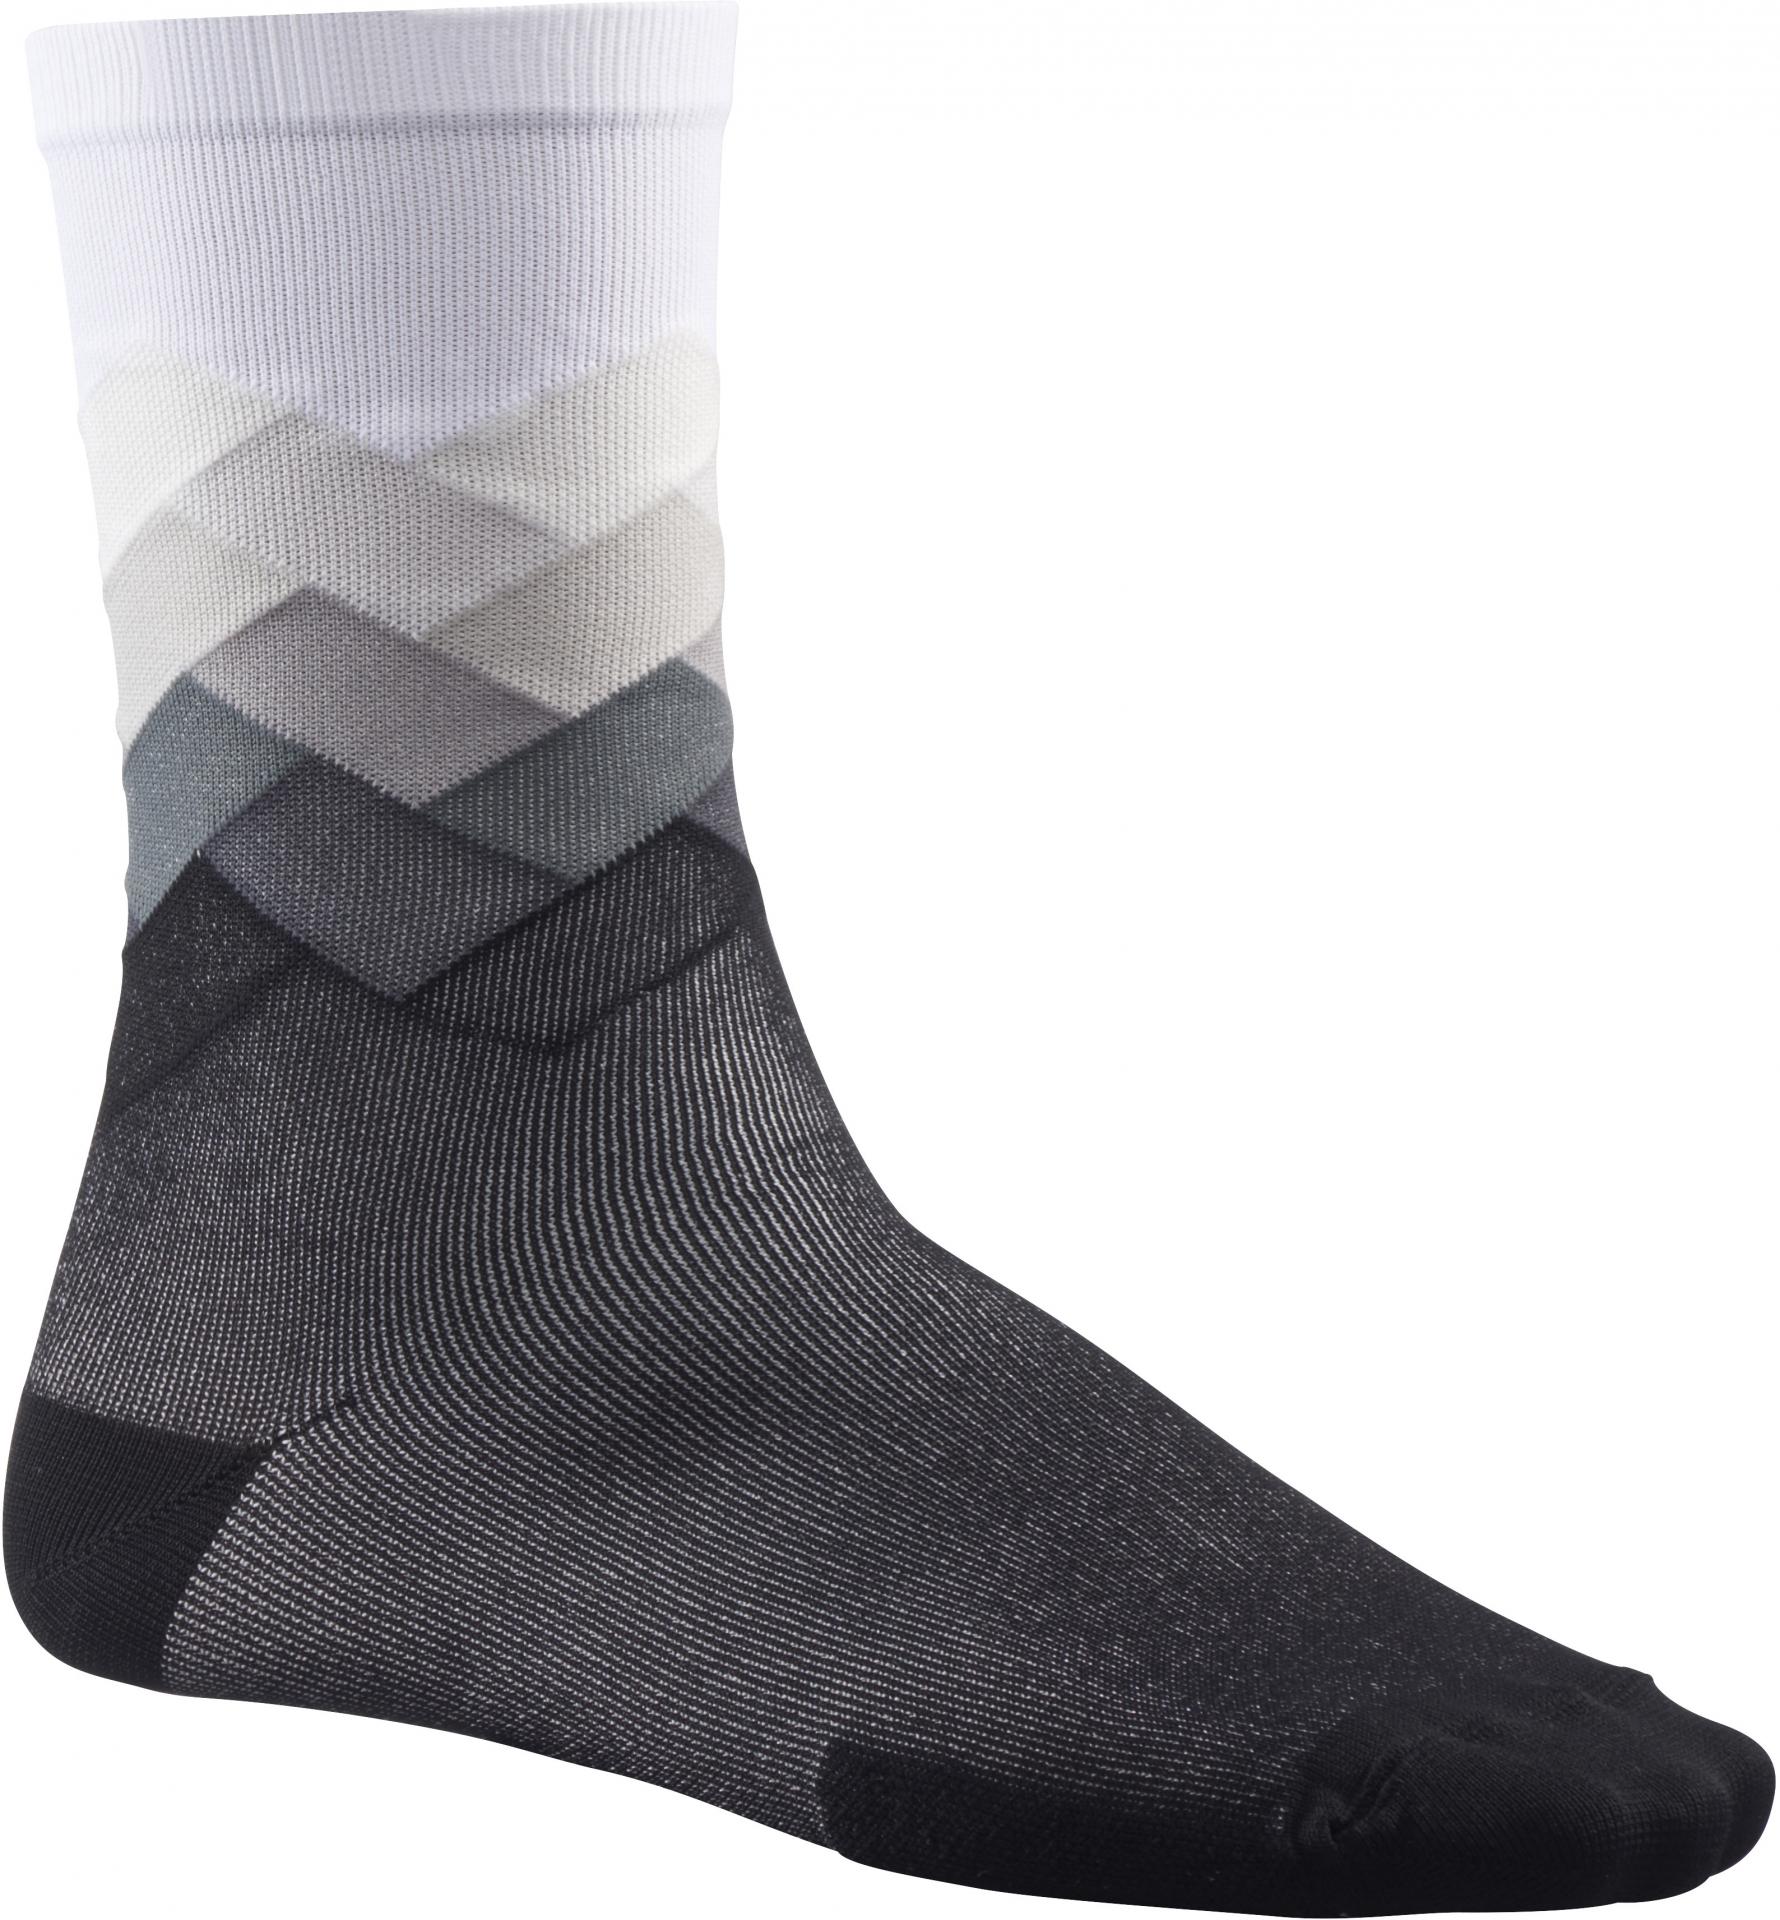 Chaussettes Mavic Cosmic Graphic Sock Blanc - 35/35